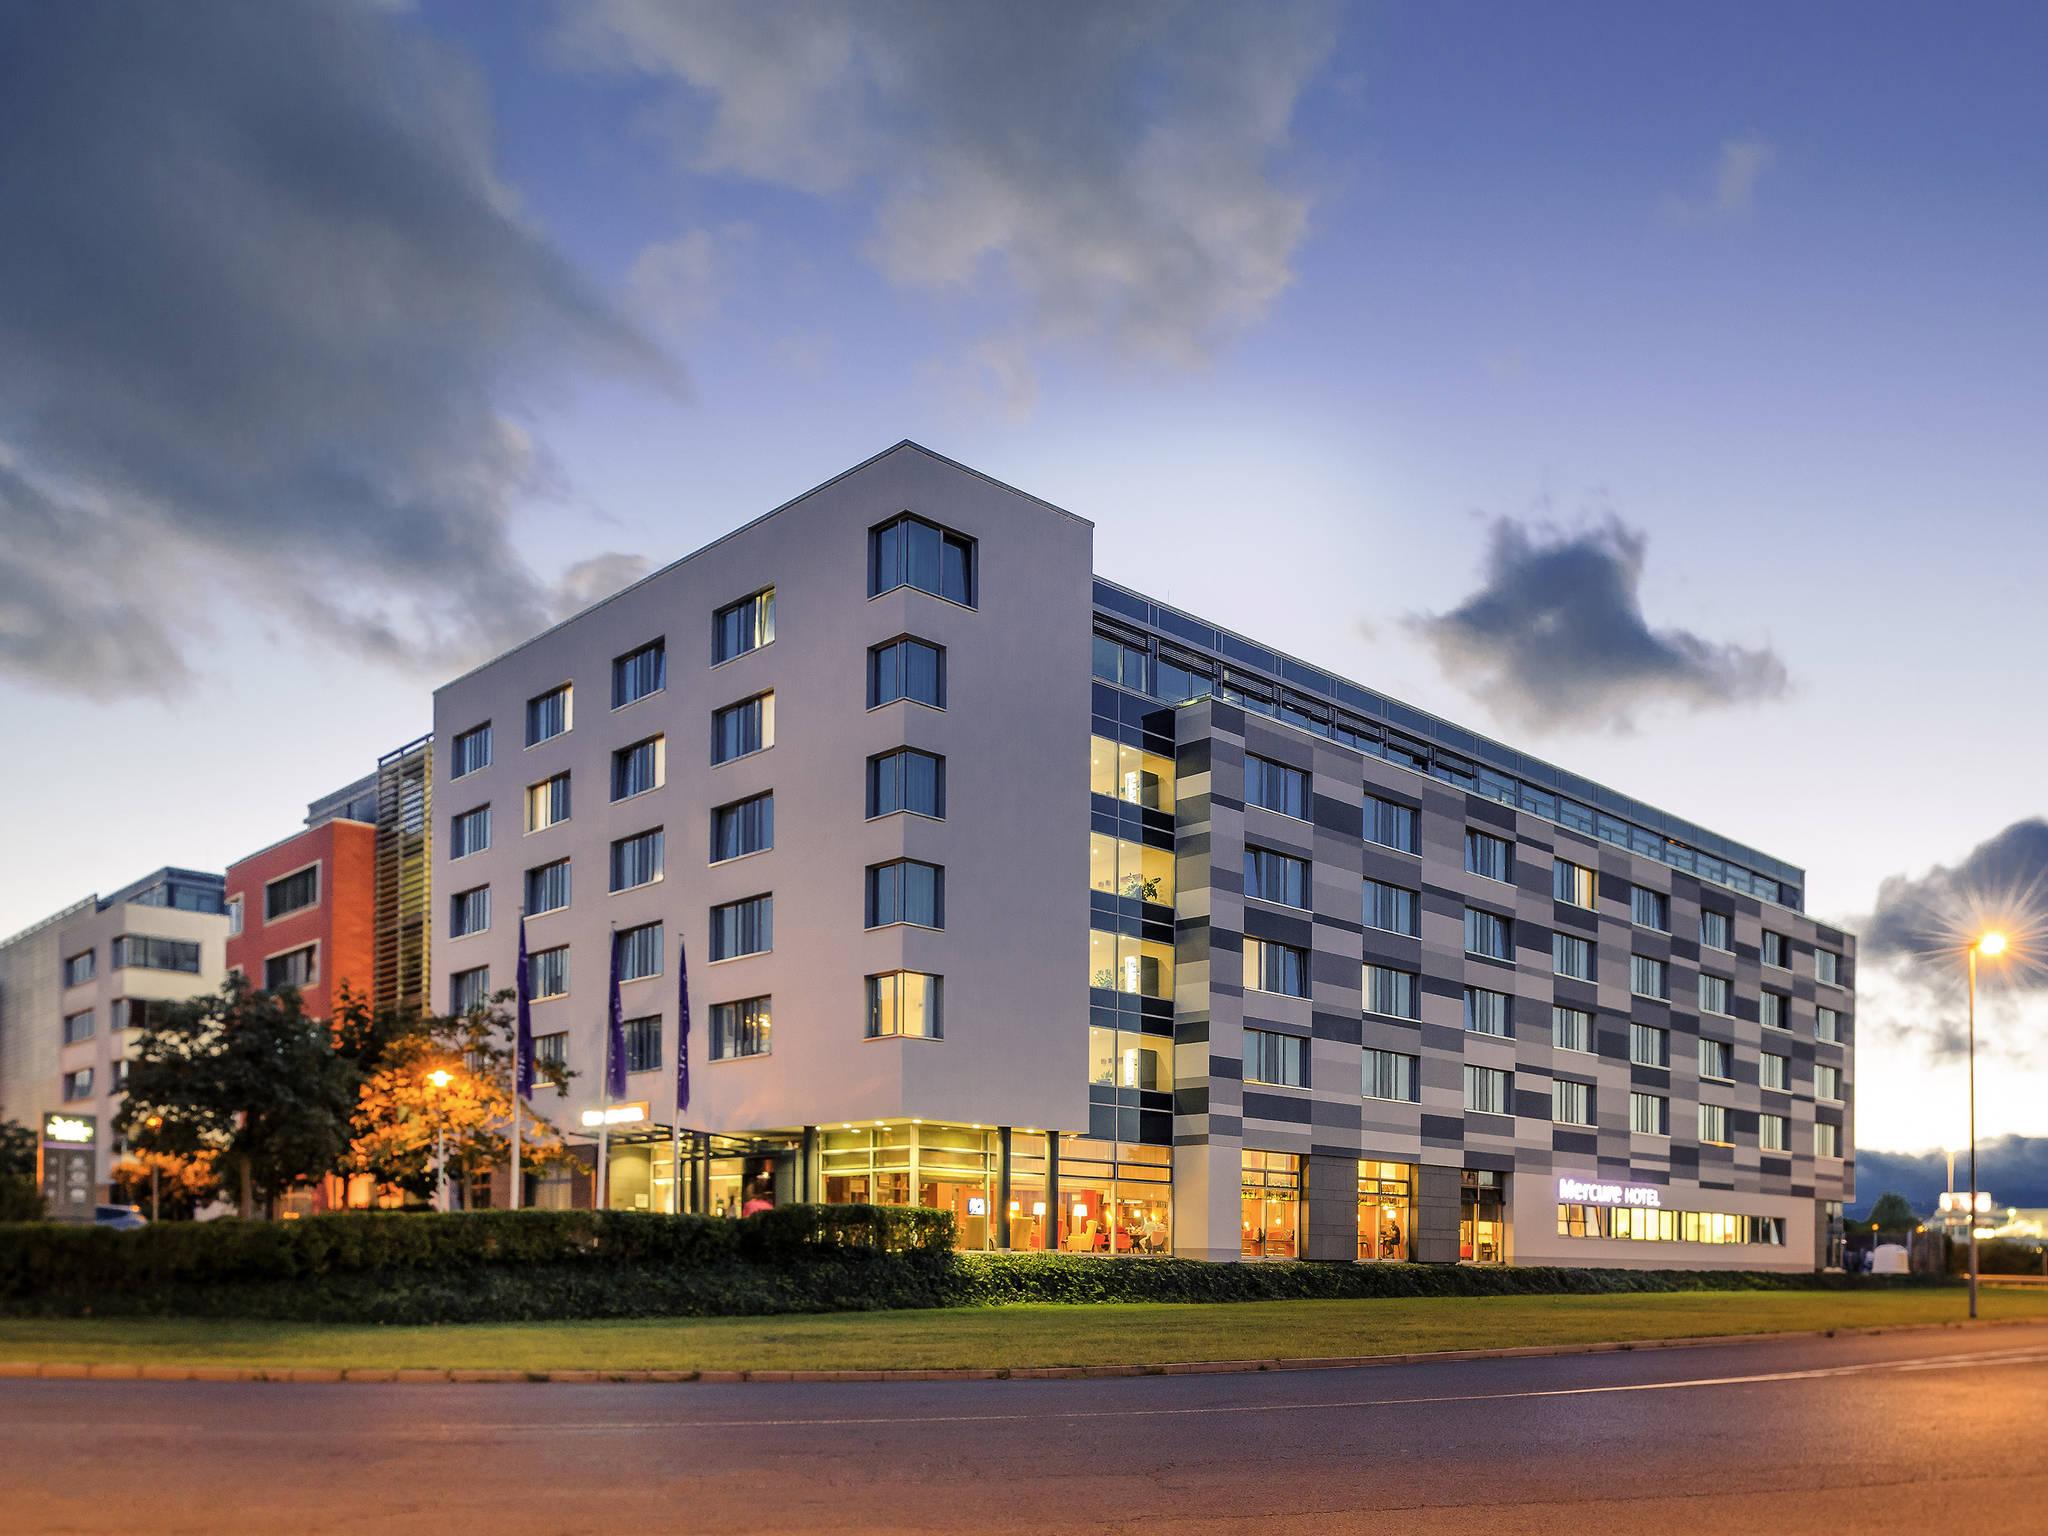 فندق - فندق مركيور MERCURE فرانكفورت إشبورن هفمان-بارك